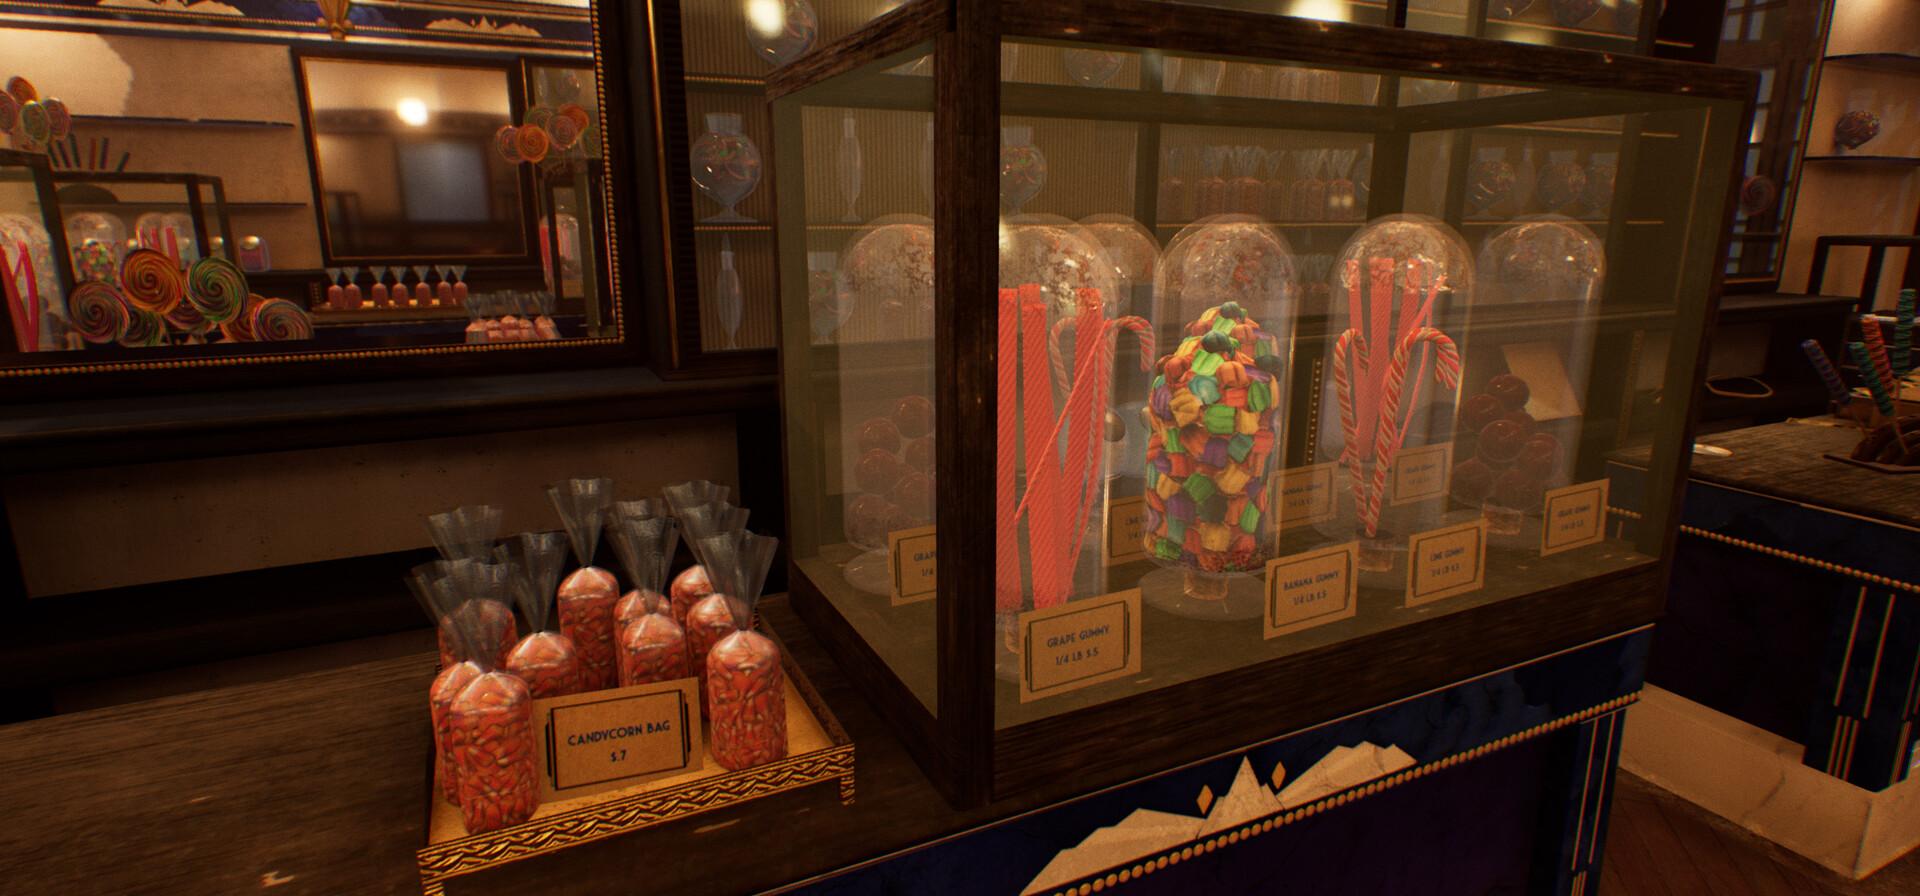 Heather dove candyshop r6 04